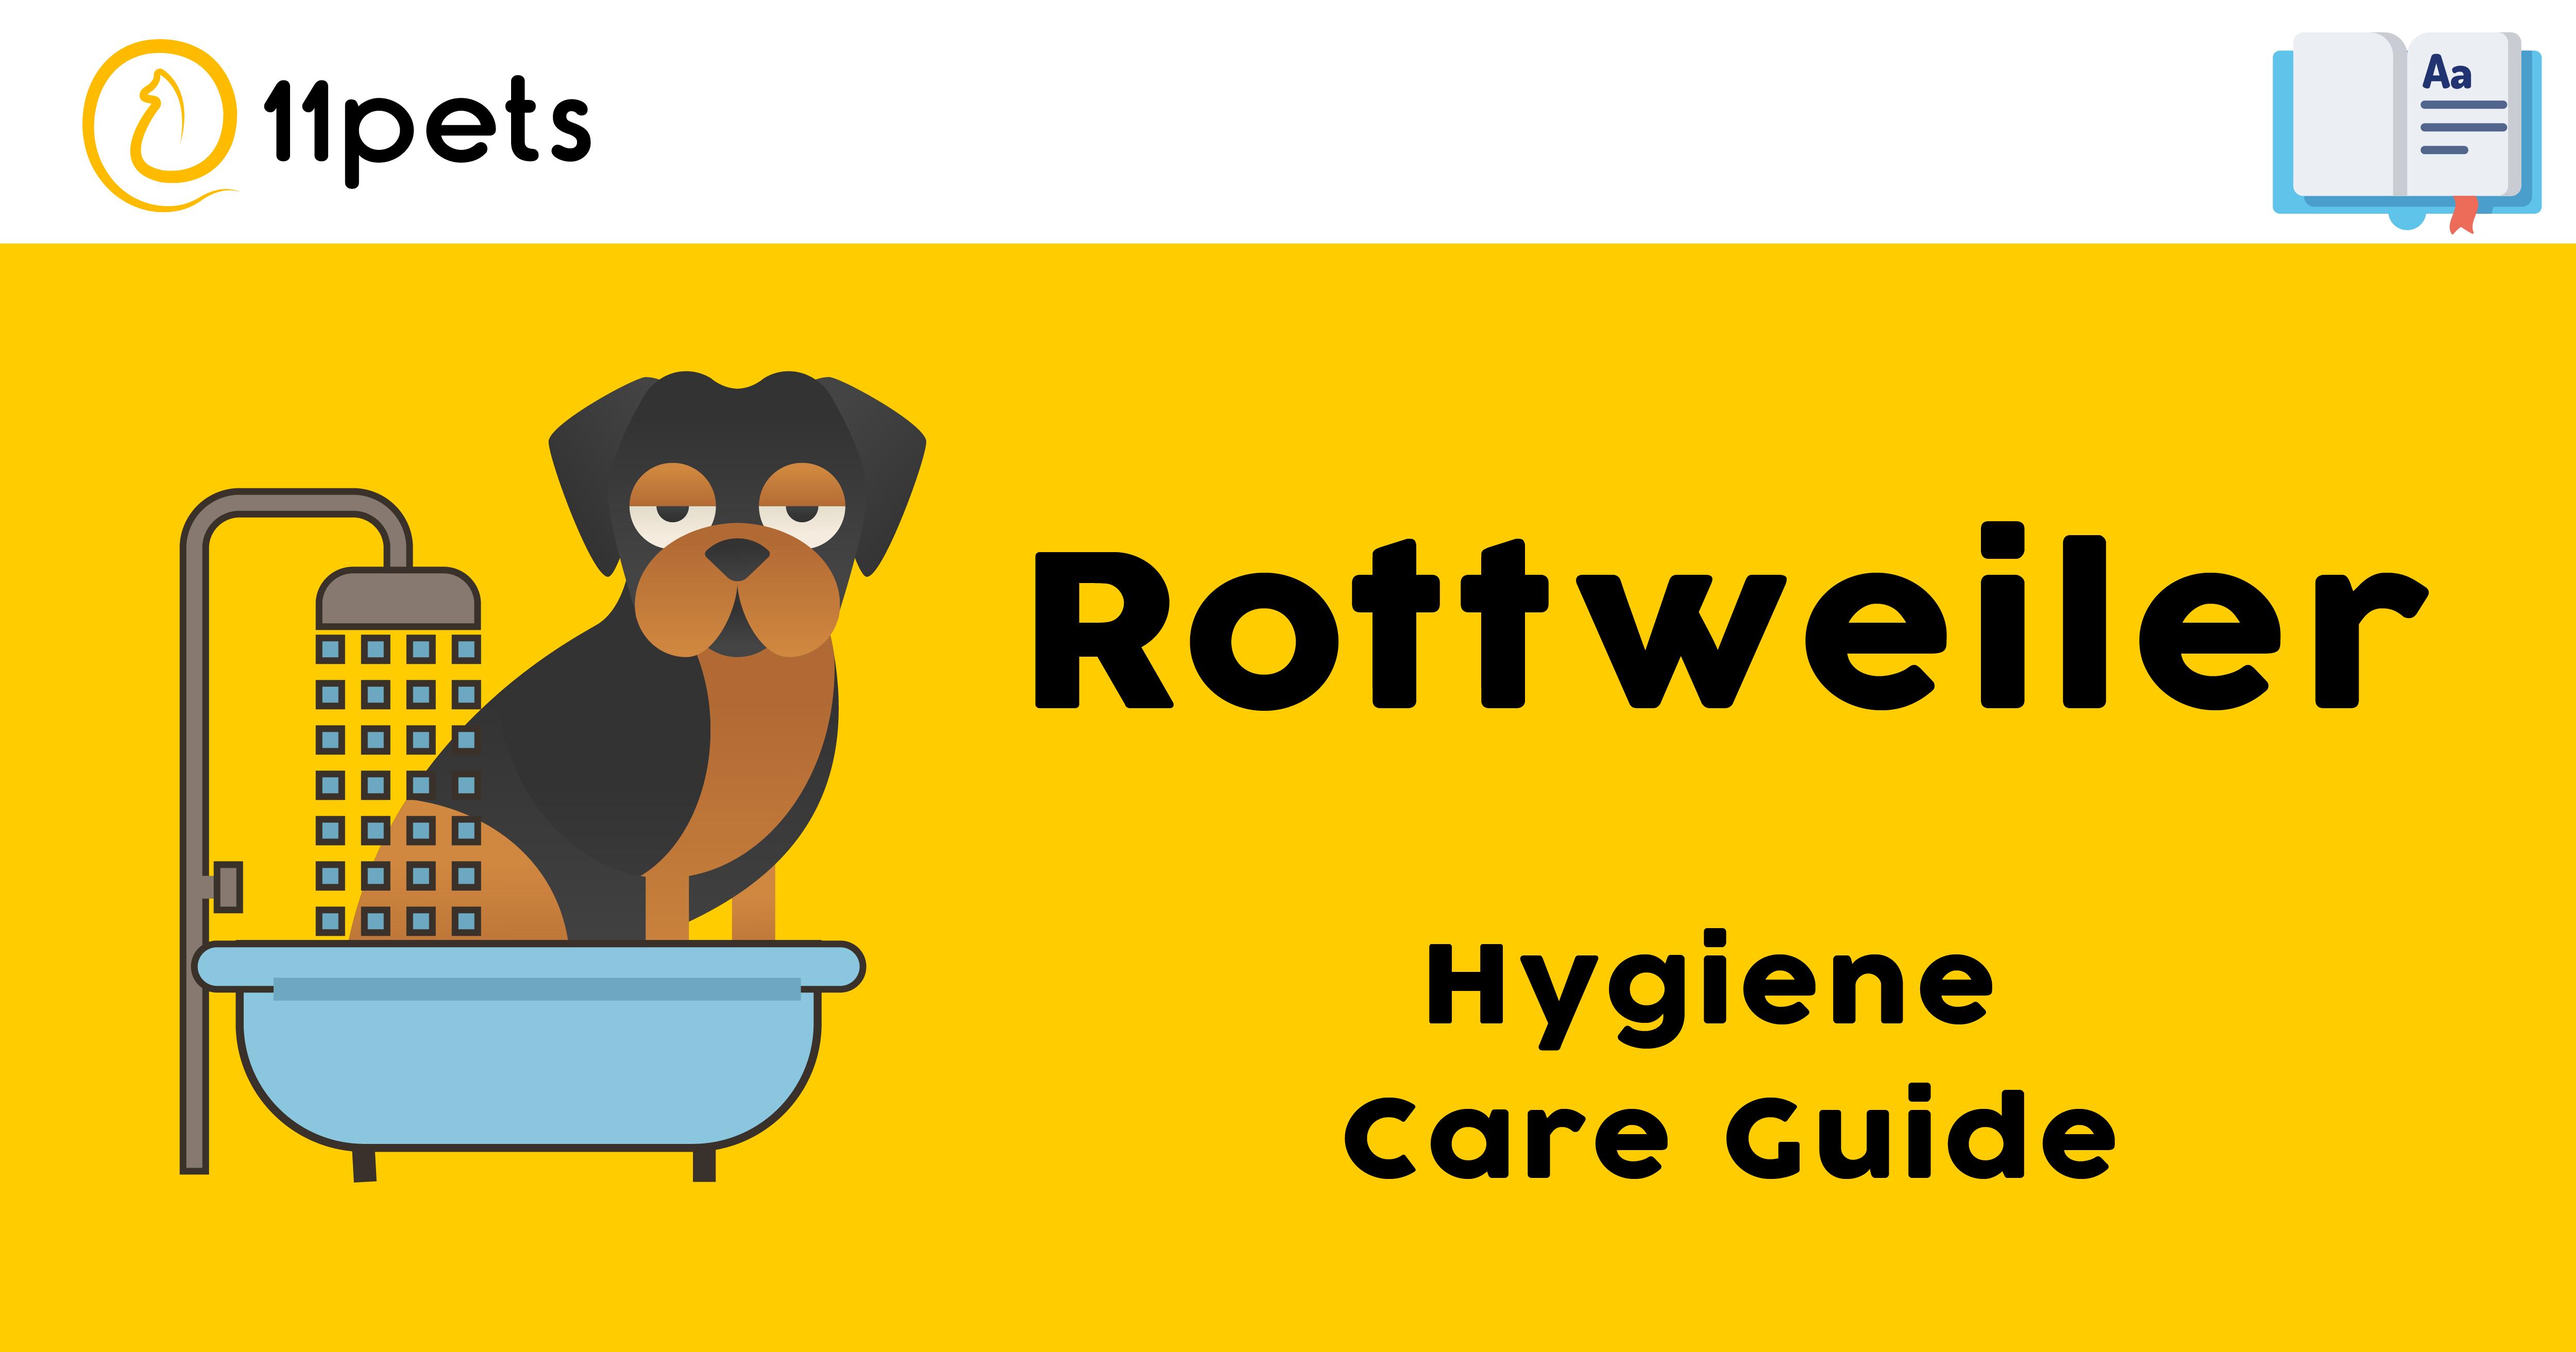 Hygiene Care Guide for Rottweiler